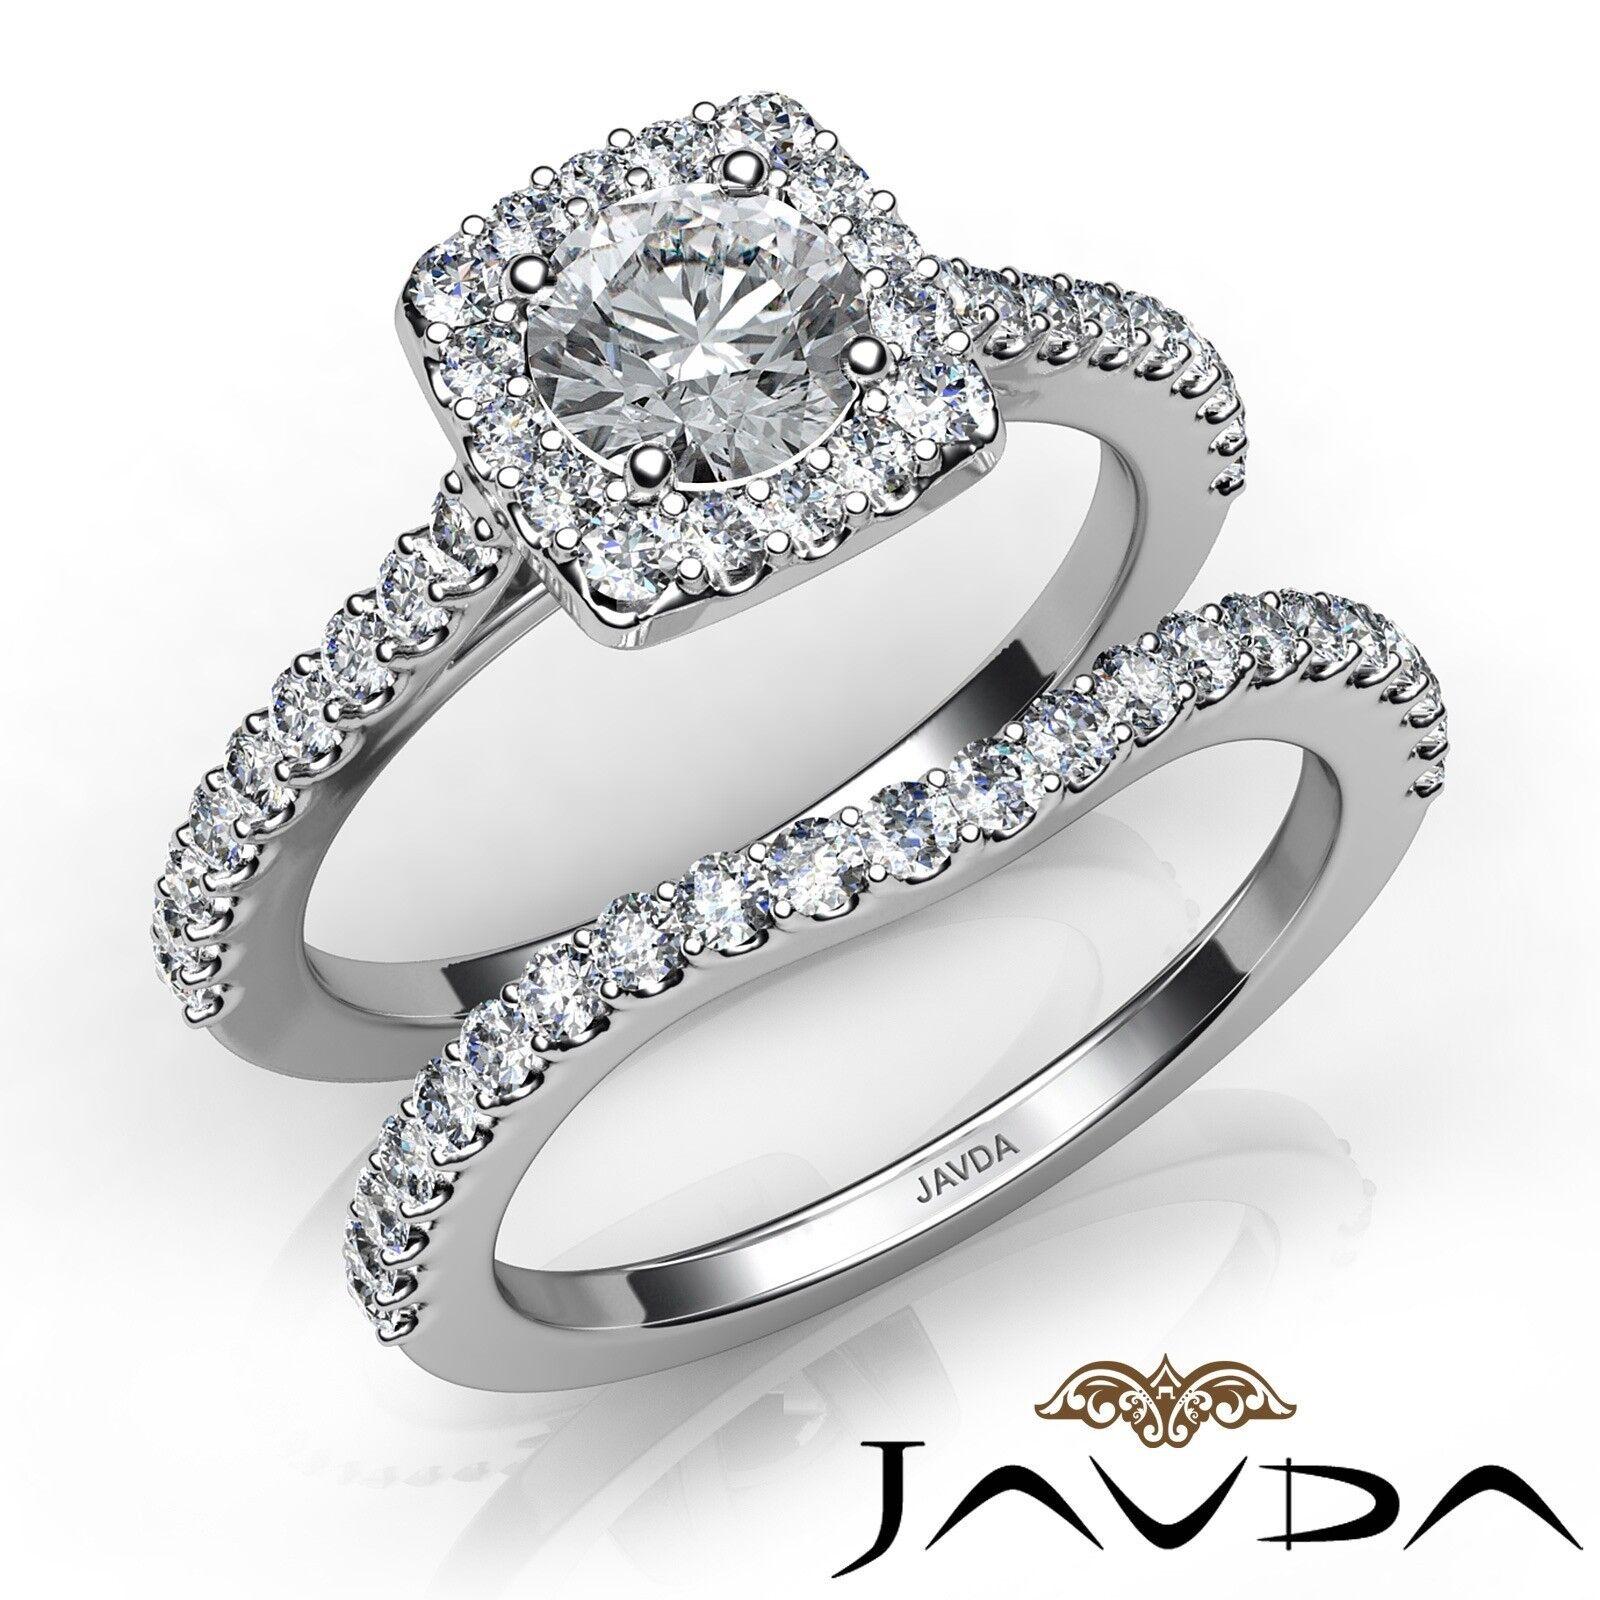 1.5ctw Halo U Prong Bridal Set Round Diamond Engagement Ring GIA G-VVS2 W Gold